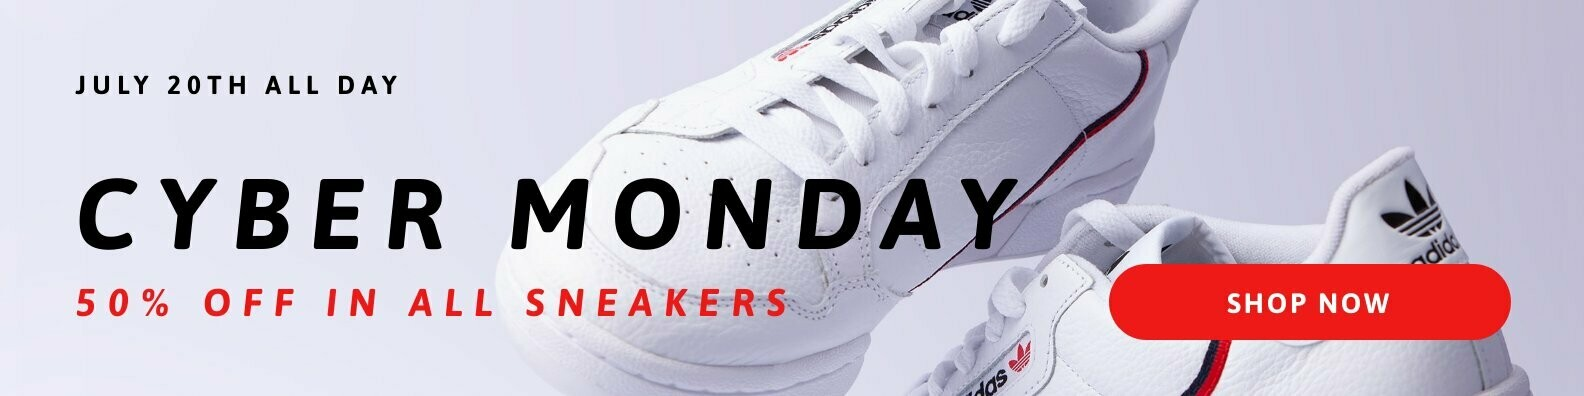 Cyber Monday Promo LinkedIn Header